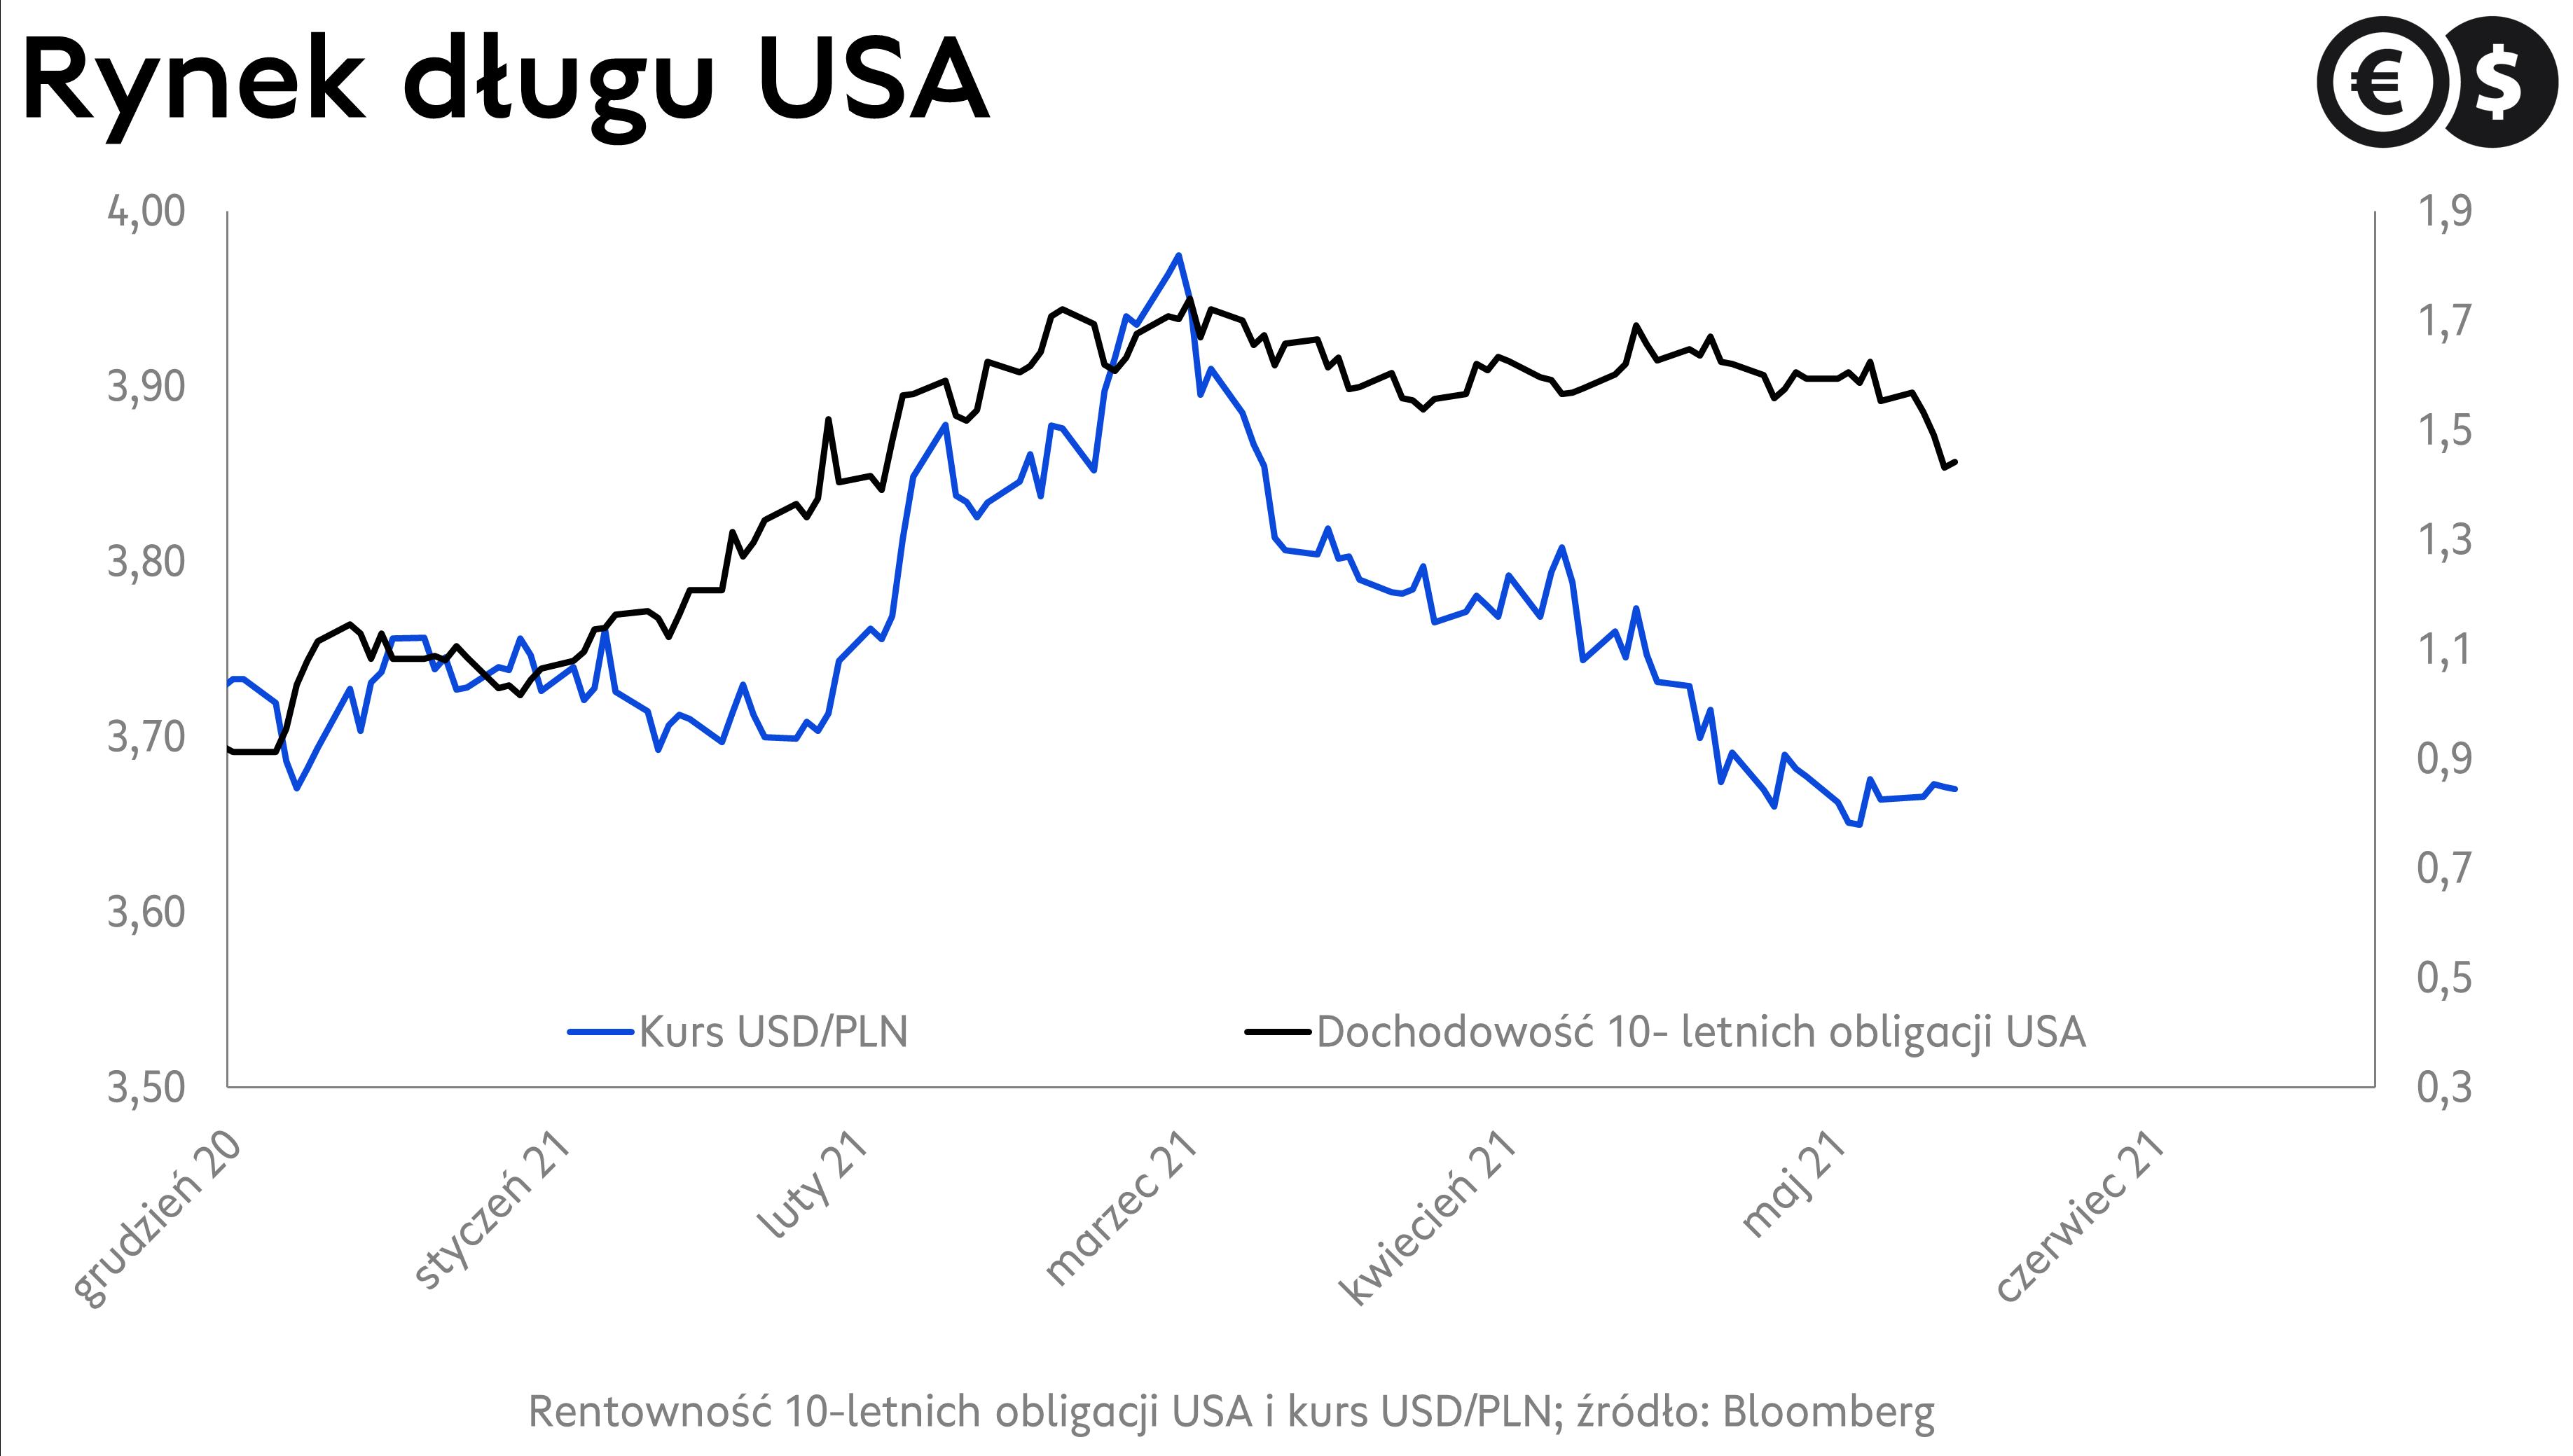 Kurs dolara i rentowność długu USA źródło: Bloomberg